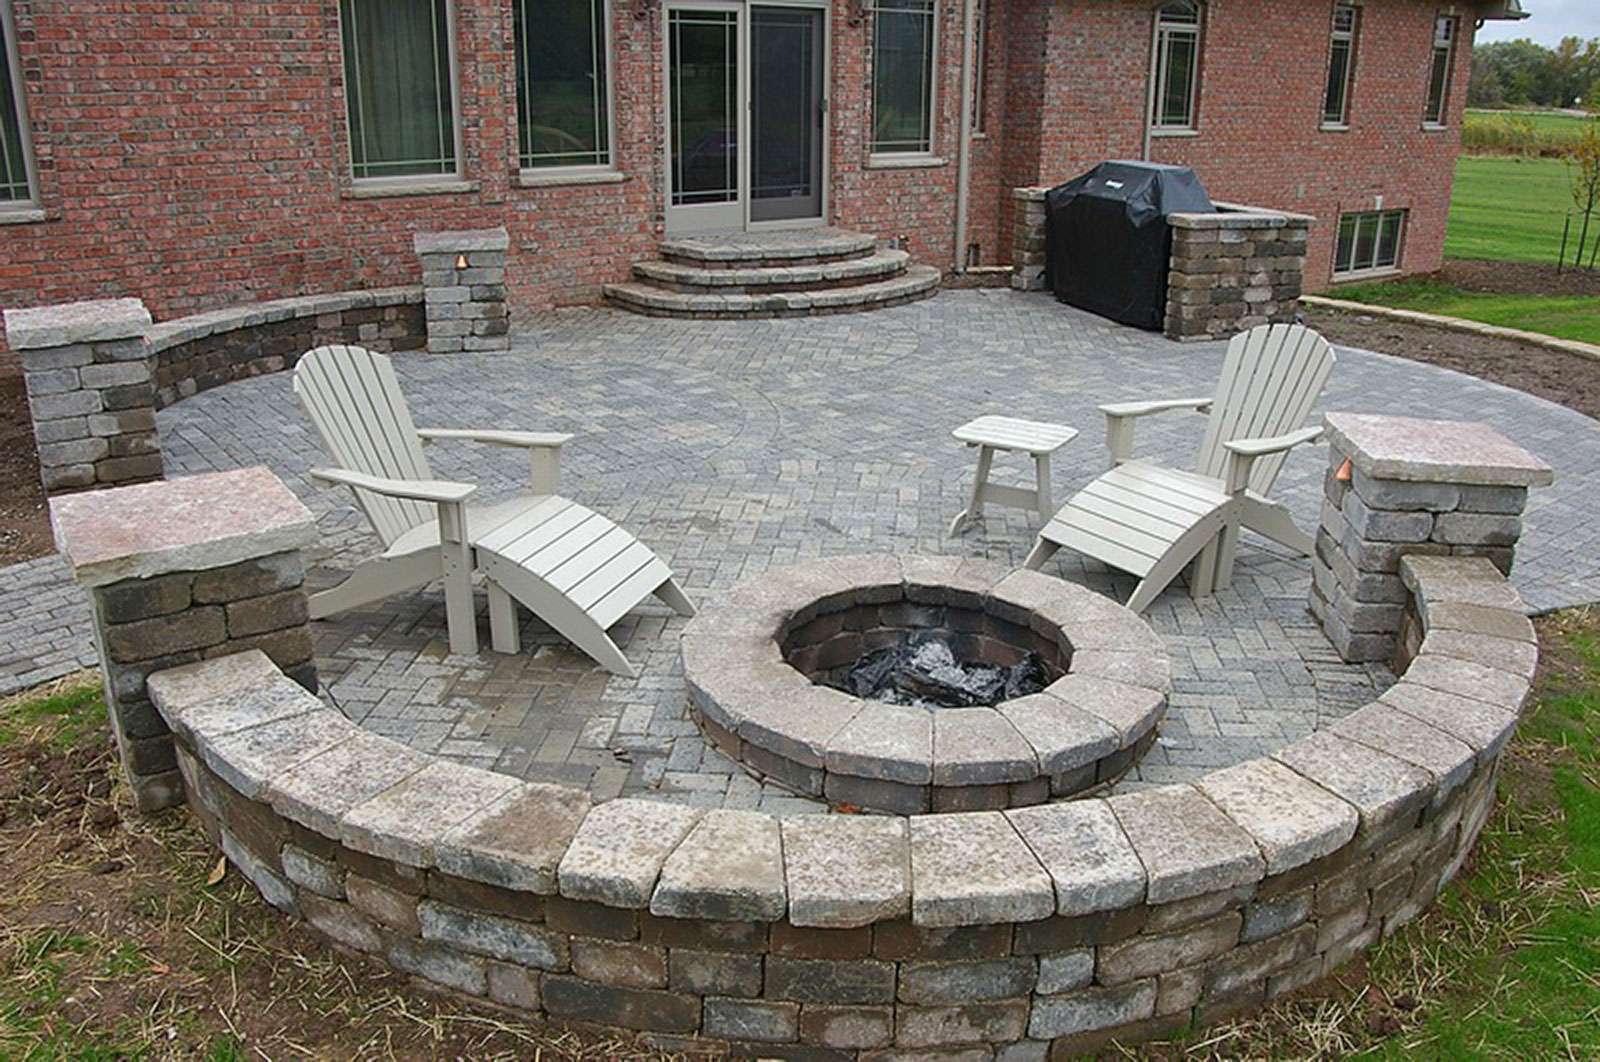 Fire Pit and Landscape Design, in Appleton, WI on Fire Pit Design  id=13299